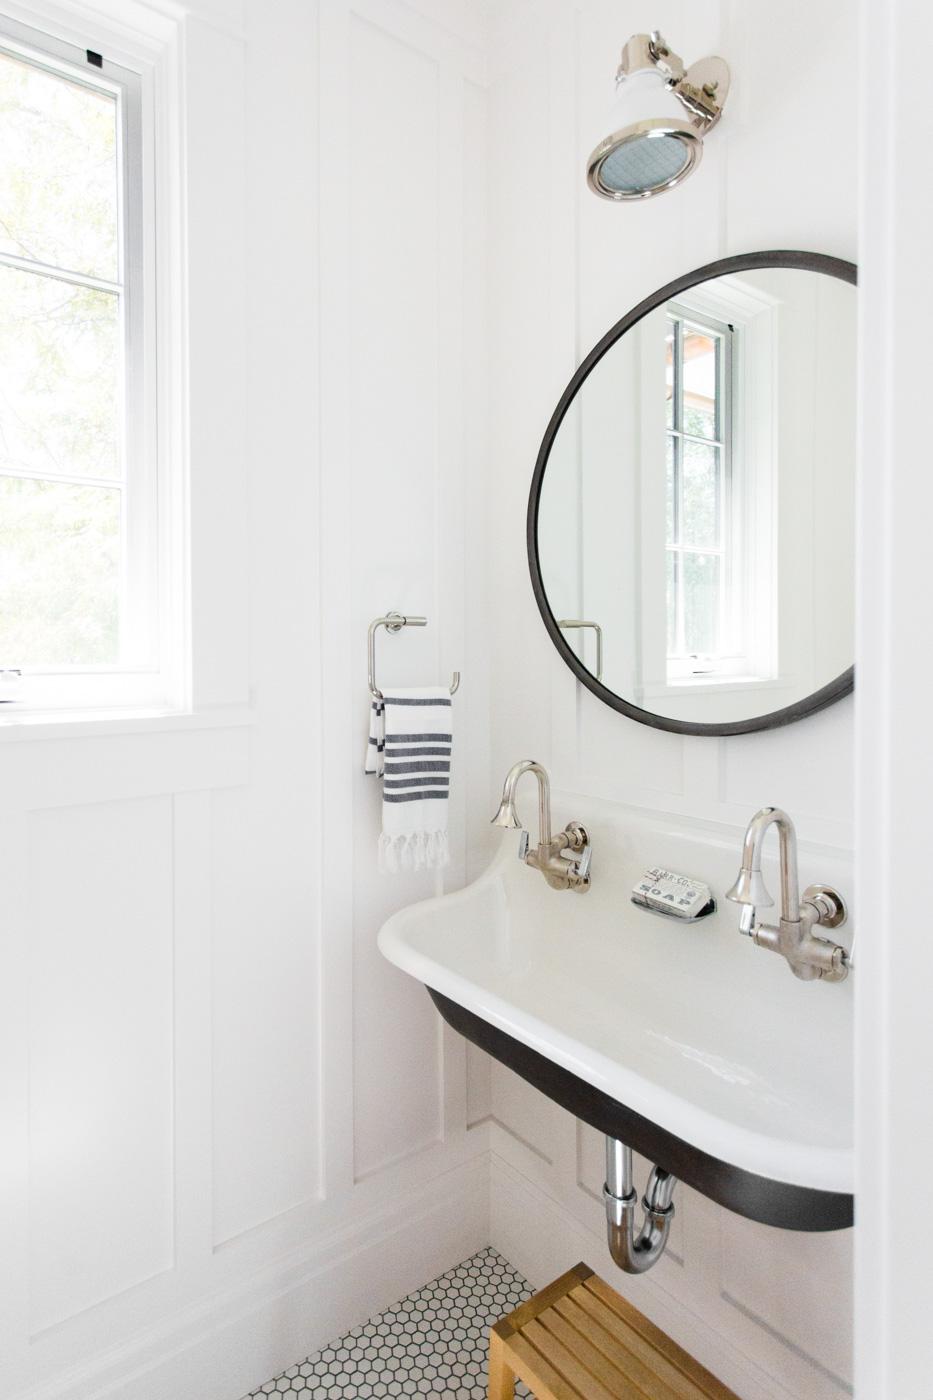 Powder+bathroom+with+black+double+sink+and+hex+floors+||+Studio+McGee.jpg